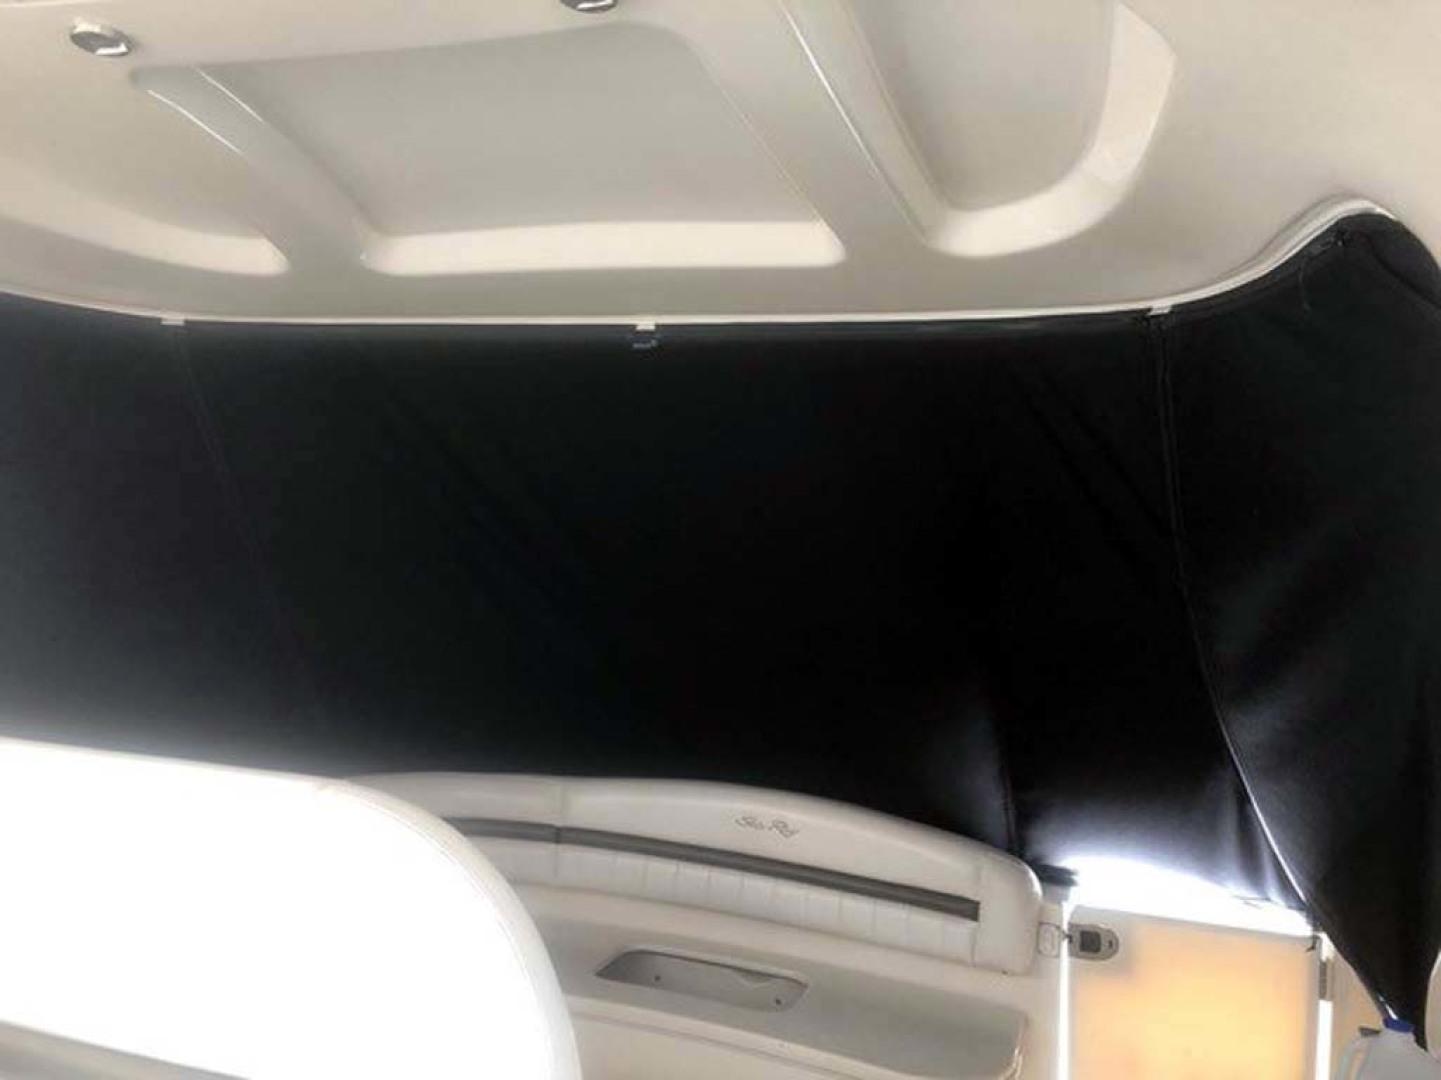 Sea Ray-Sundancer 2006-Late Fee Destin-Florida-United States-New Cockpit Cover 9/2019-1225103 | Thumbnail